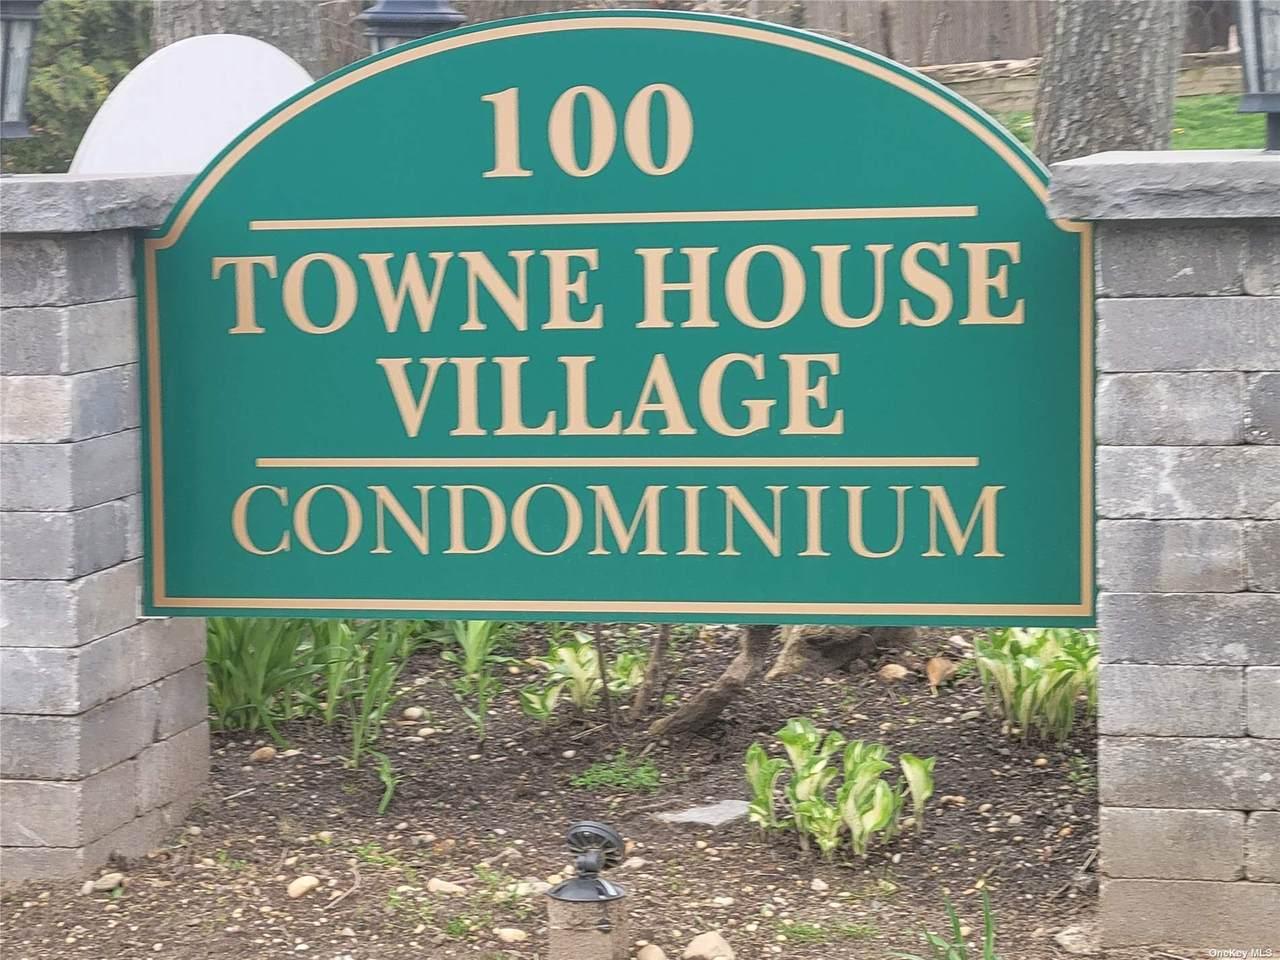 701 Towne House Vlg Drive - Photo 1